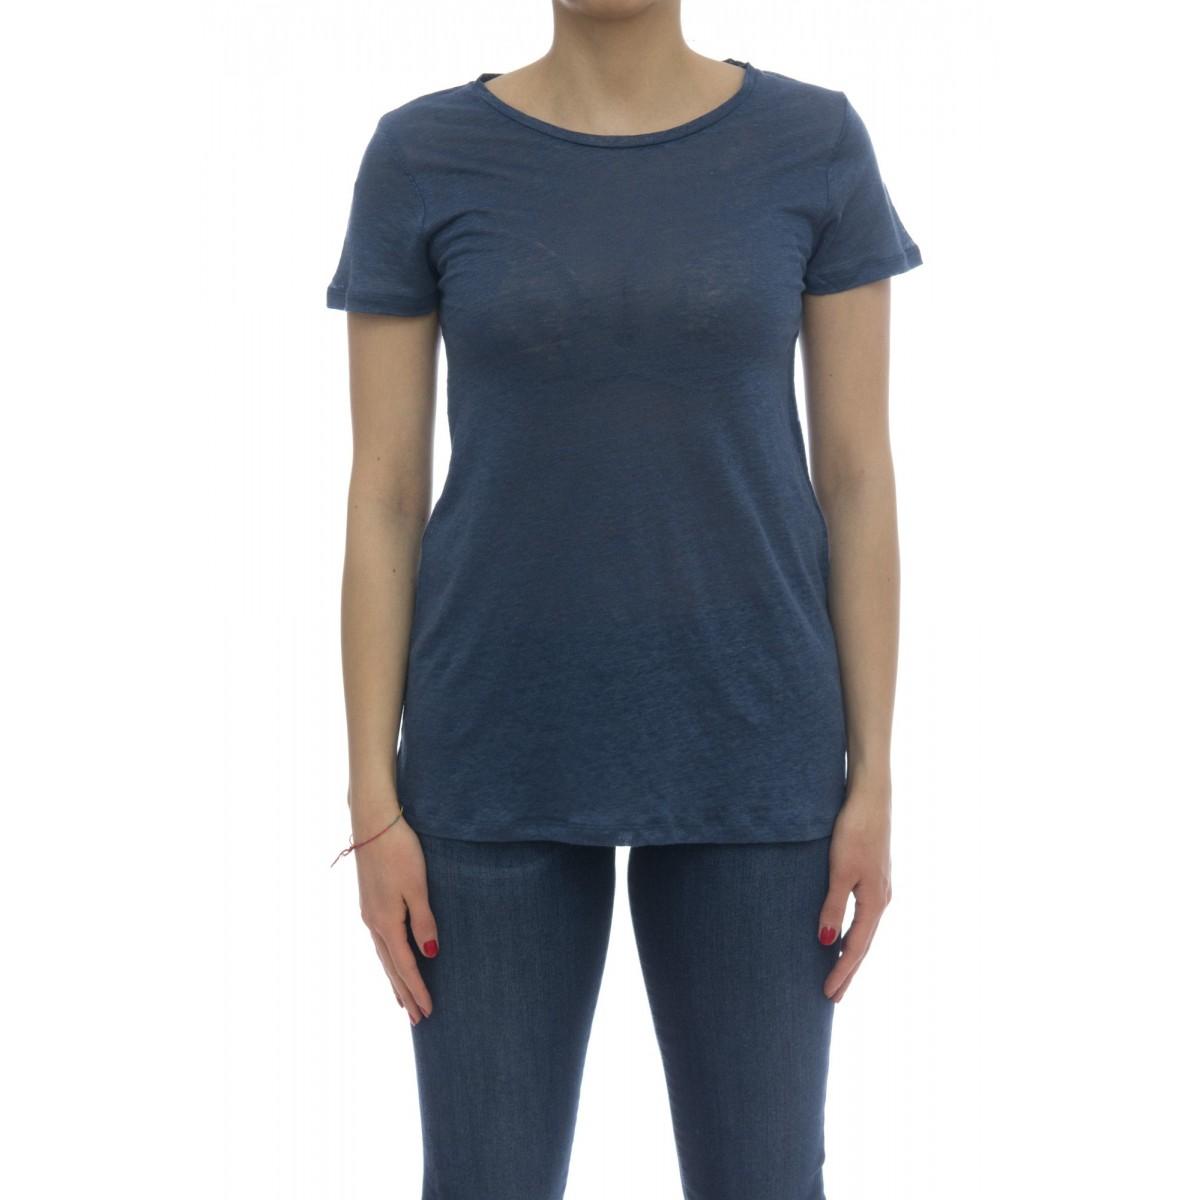 T-shirt - E05 10 100% lino